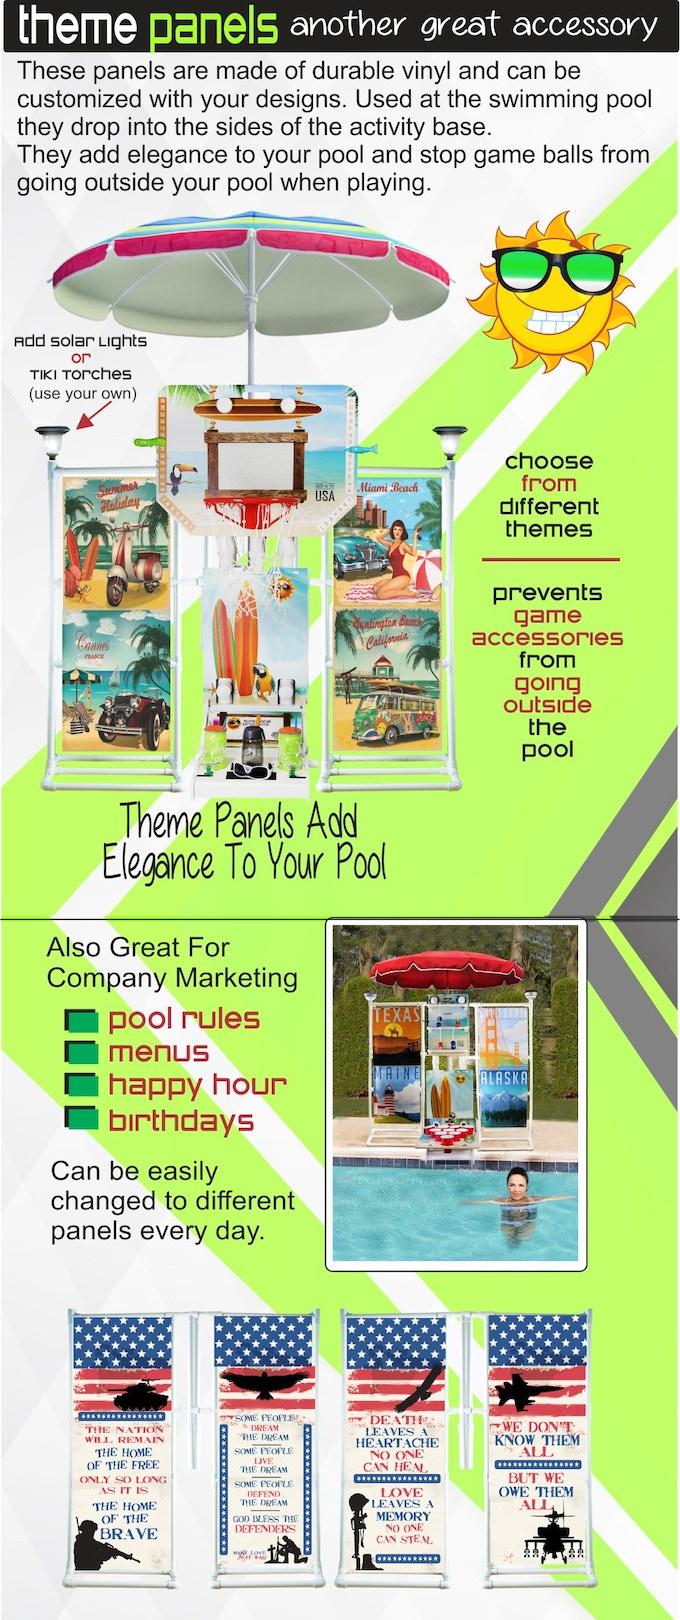 Theme Panels